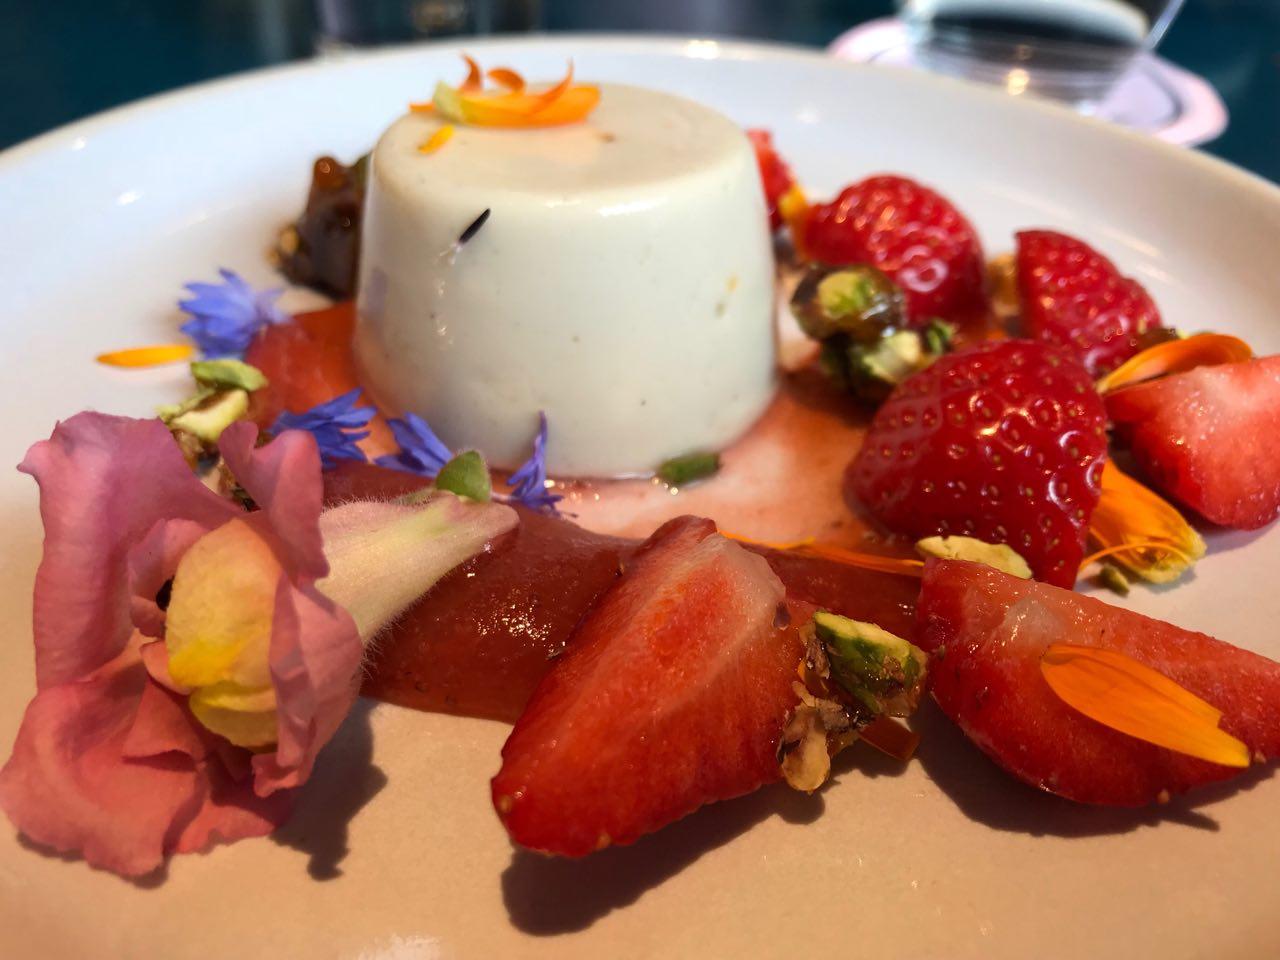 Lori's beautiful fruity dessert at The Good Egg